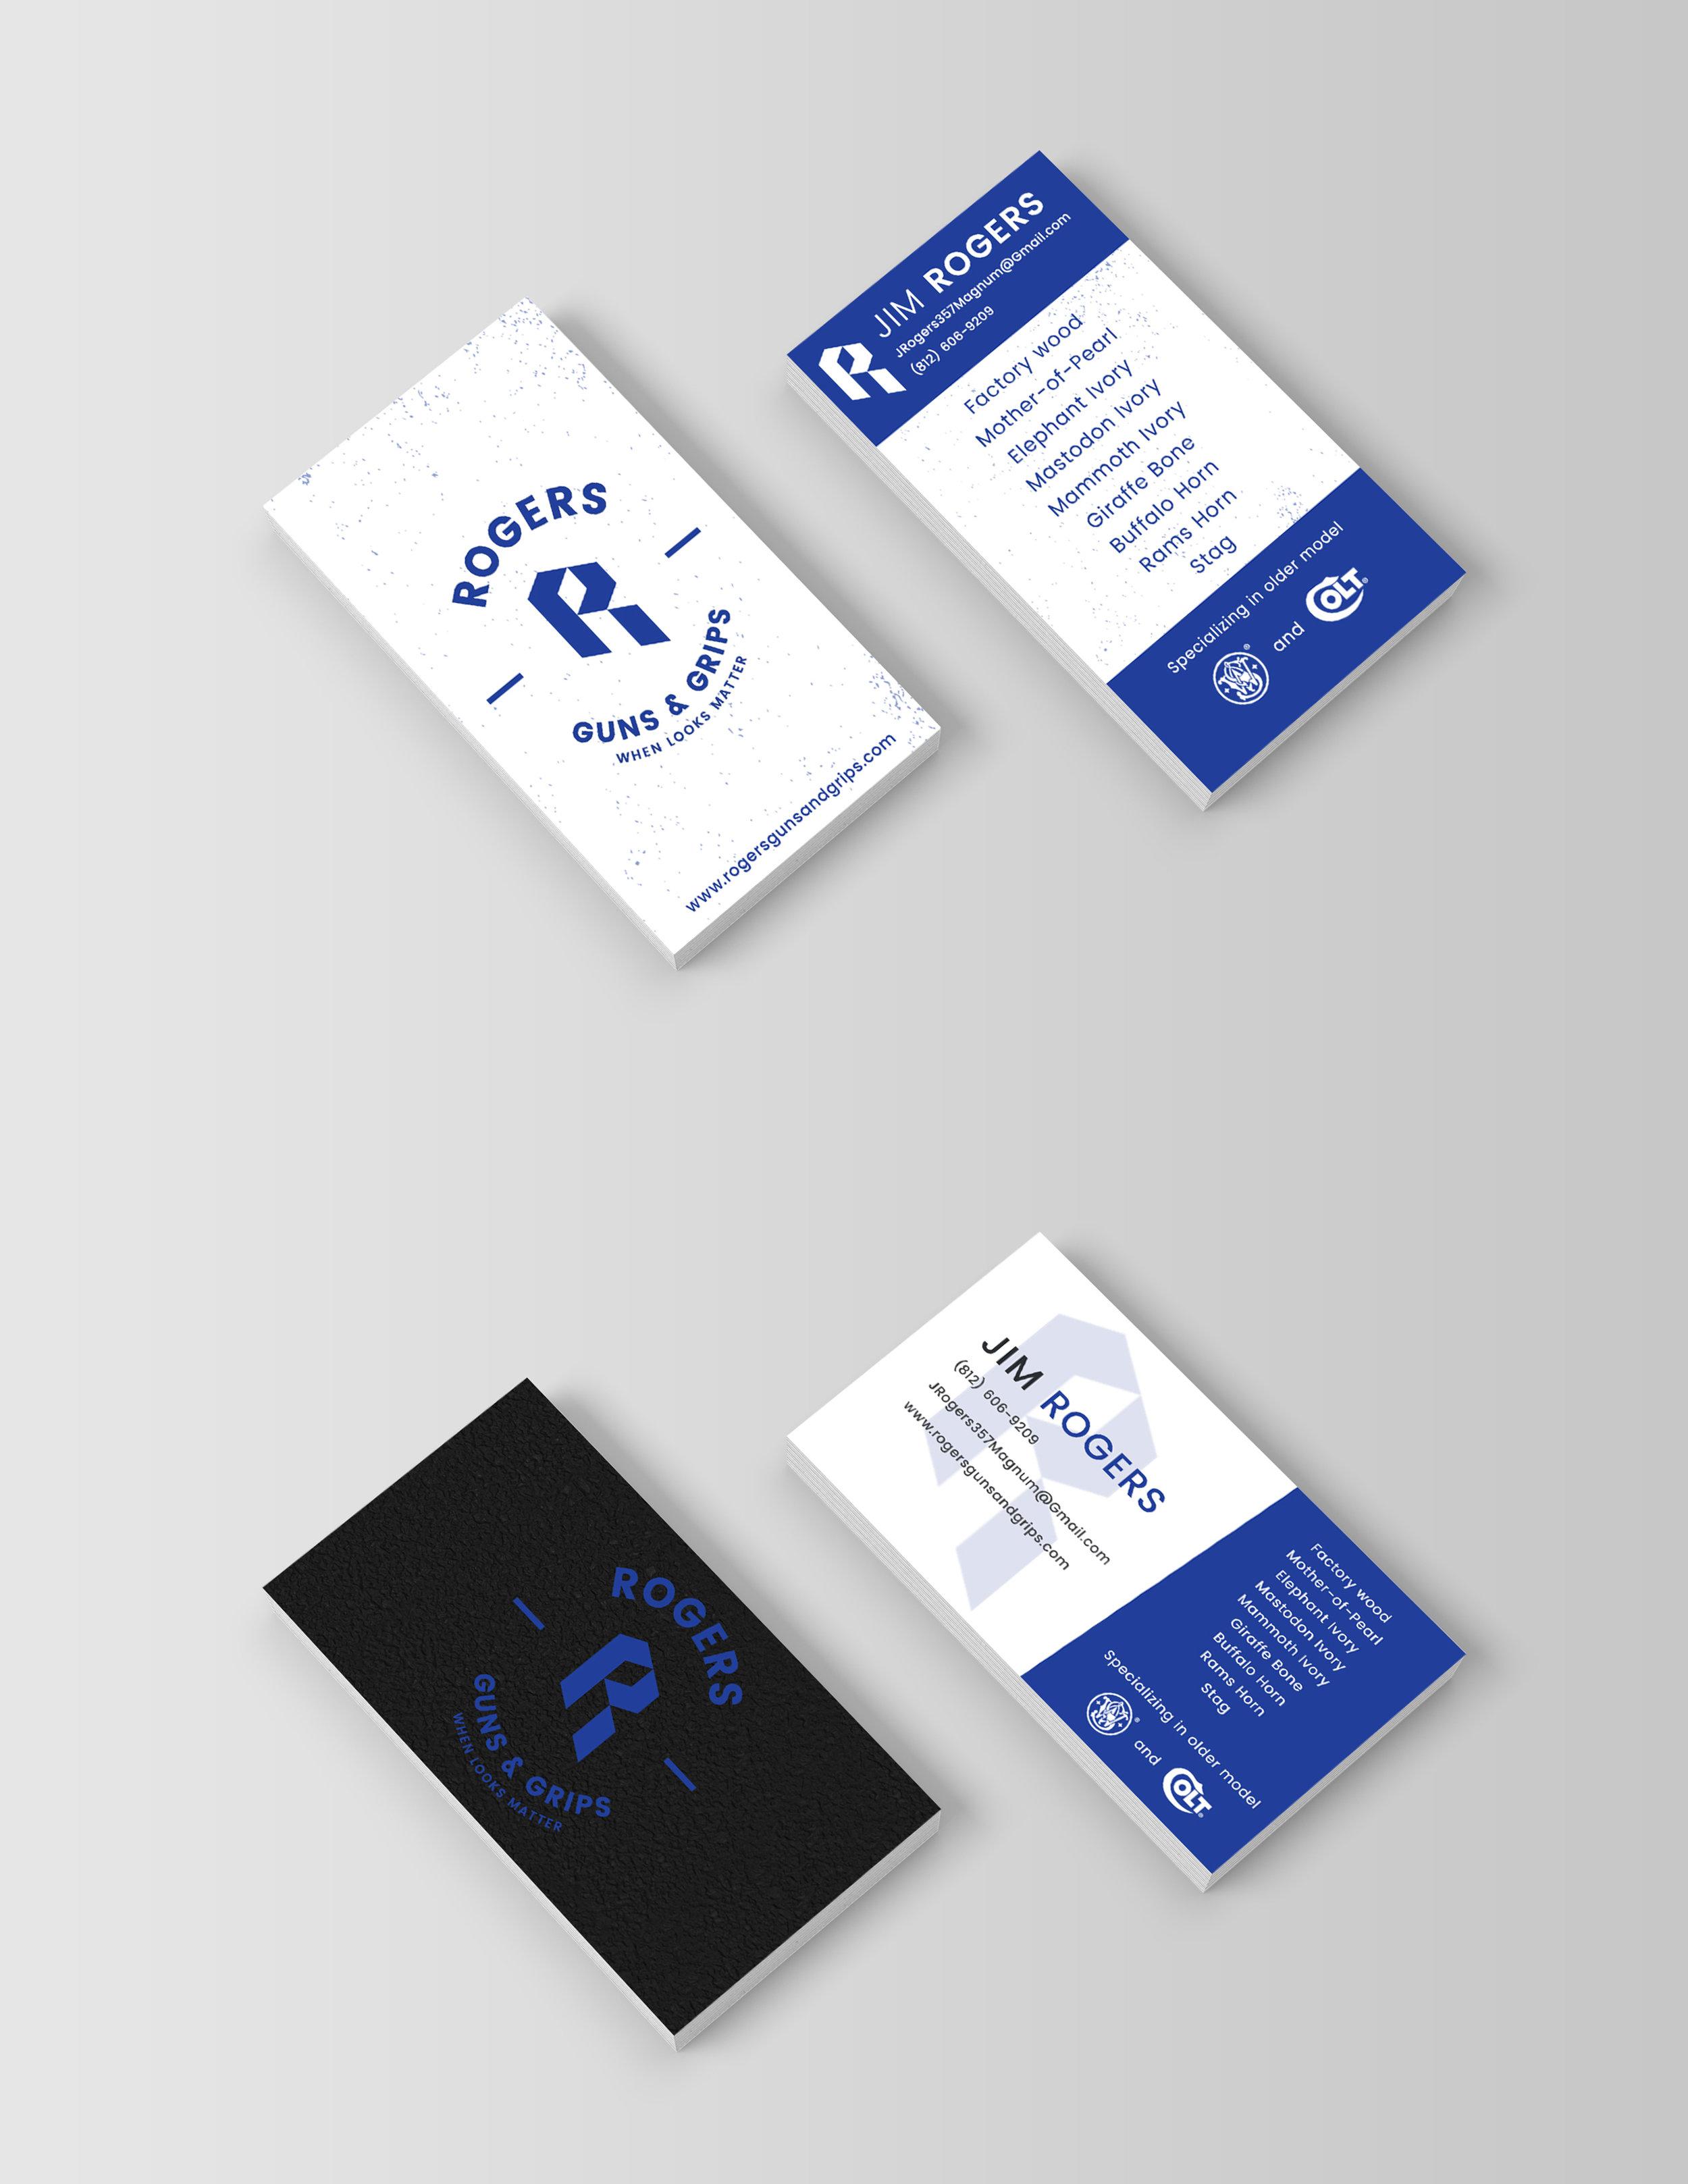 Design_Work_5.jpg